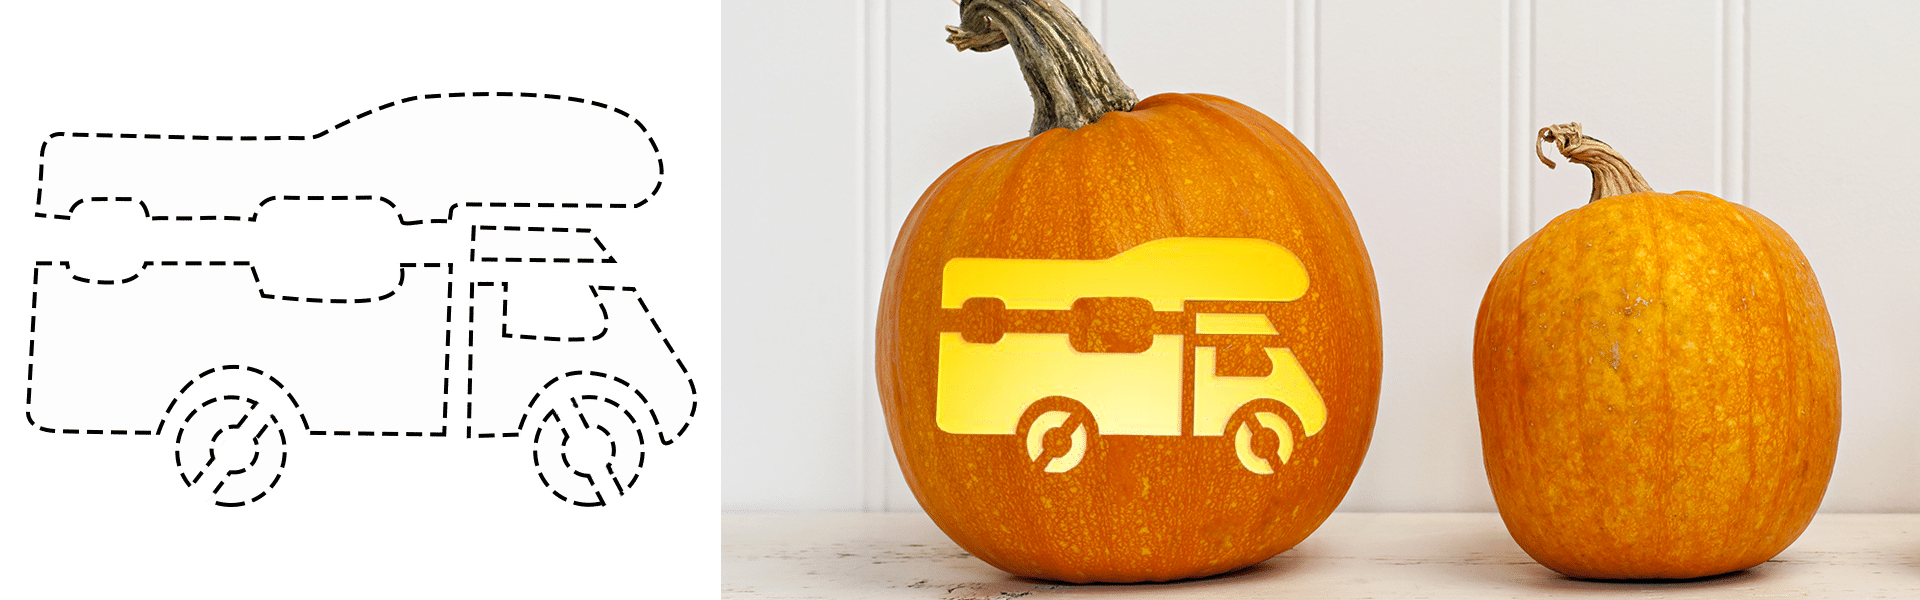 Come creare una zucca per Halloween a tema camper e caravan